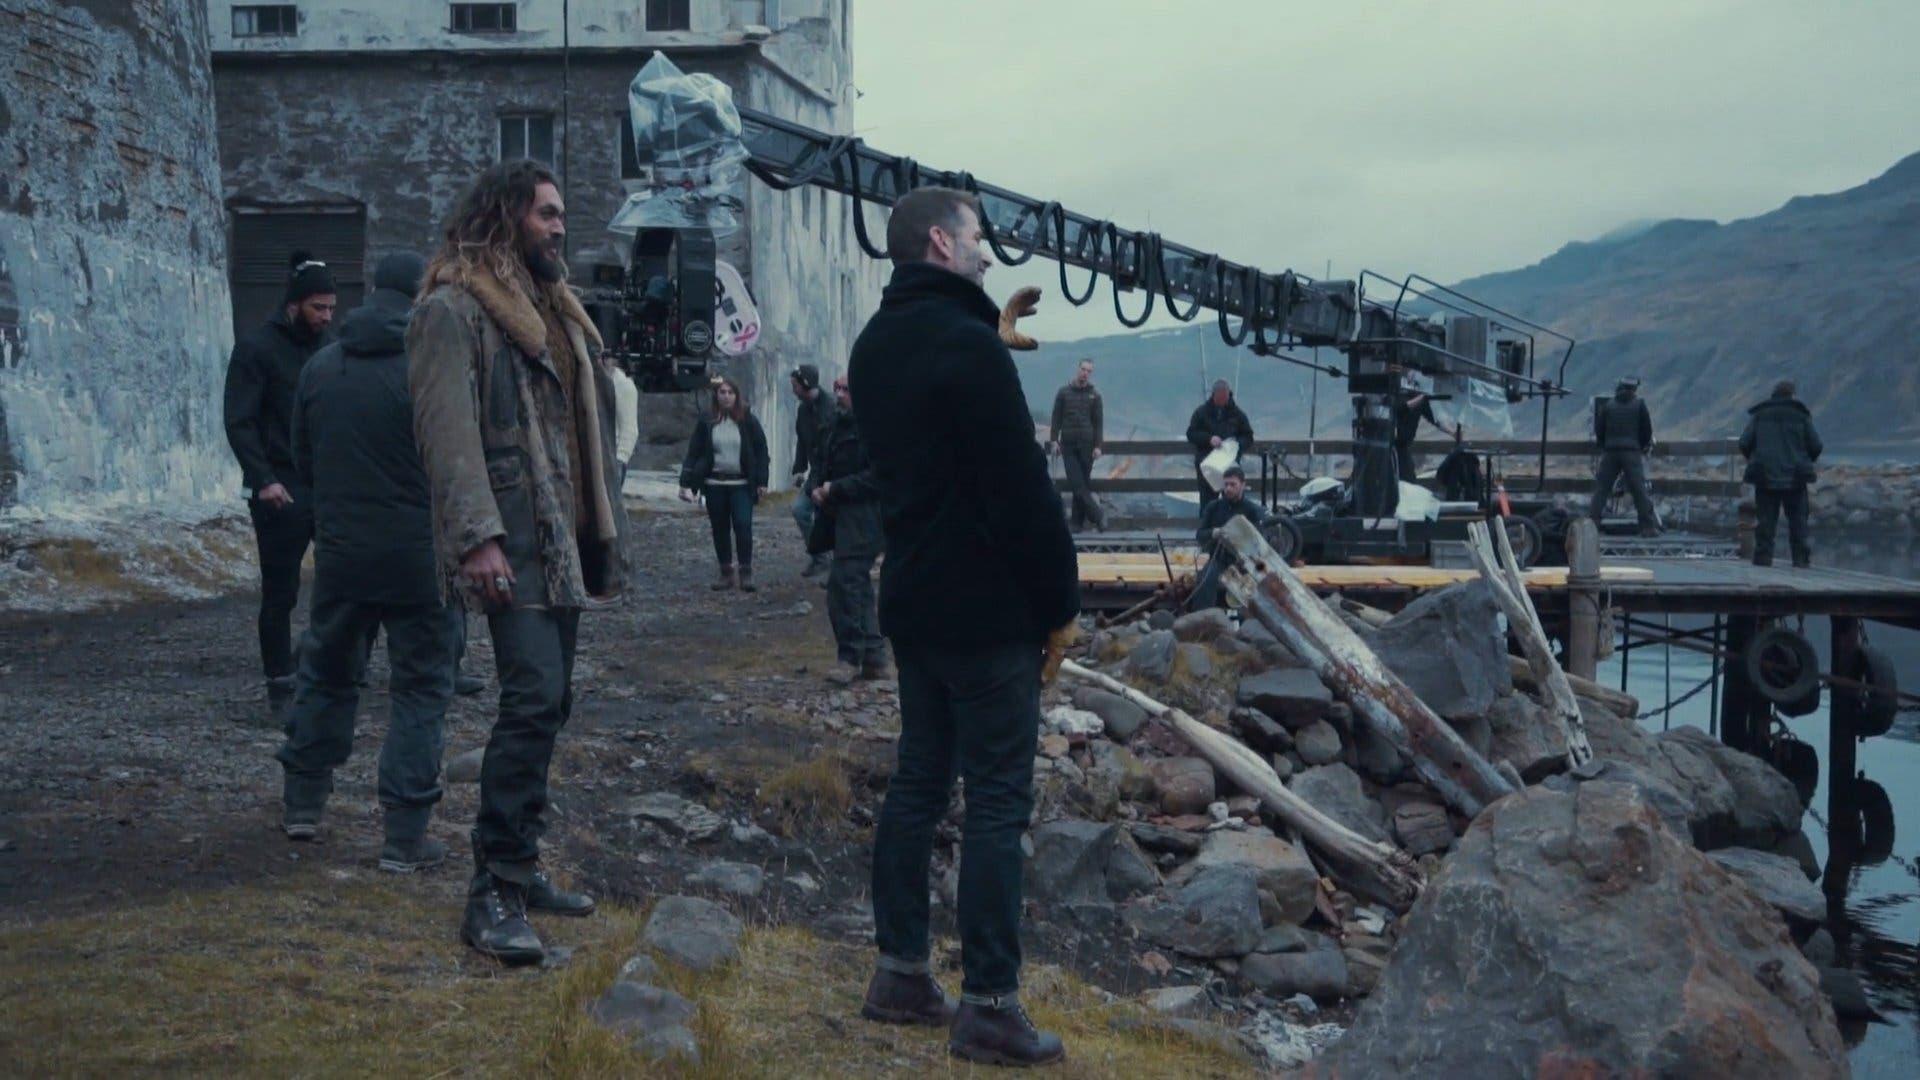 Liga de la Justicia Zack Snyder (Aquaman Jason Momoa) 3